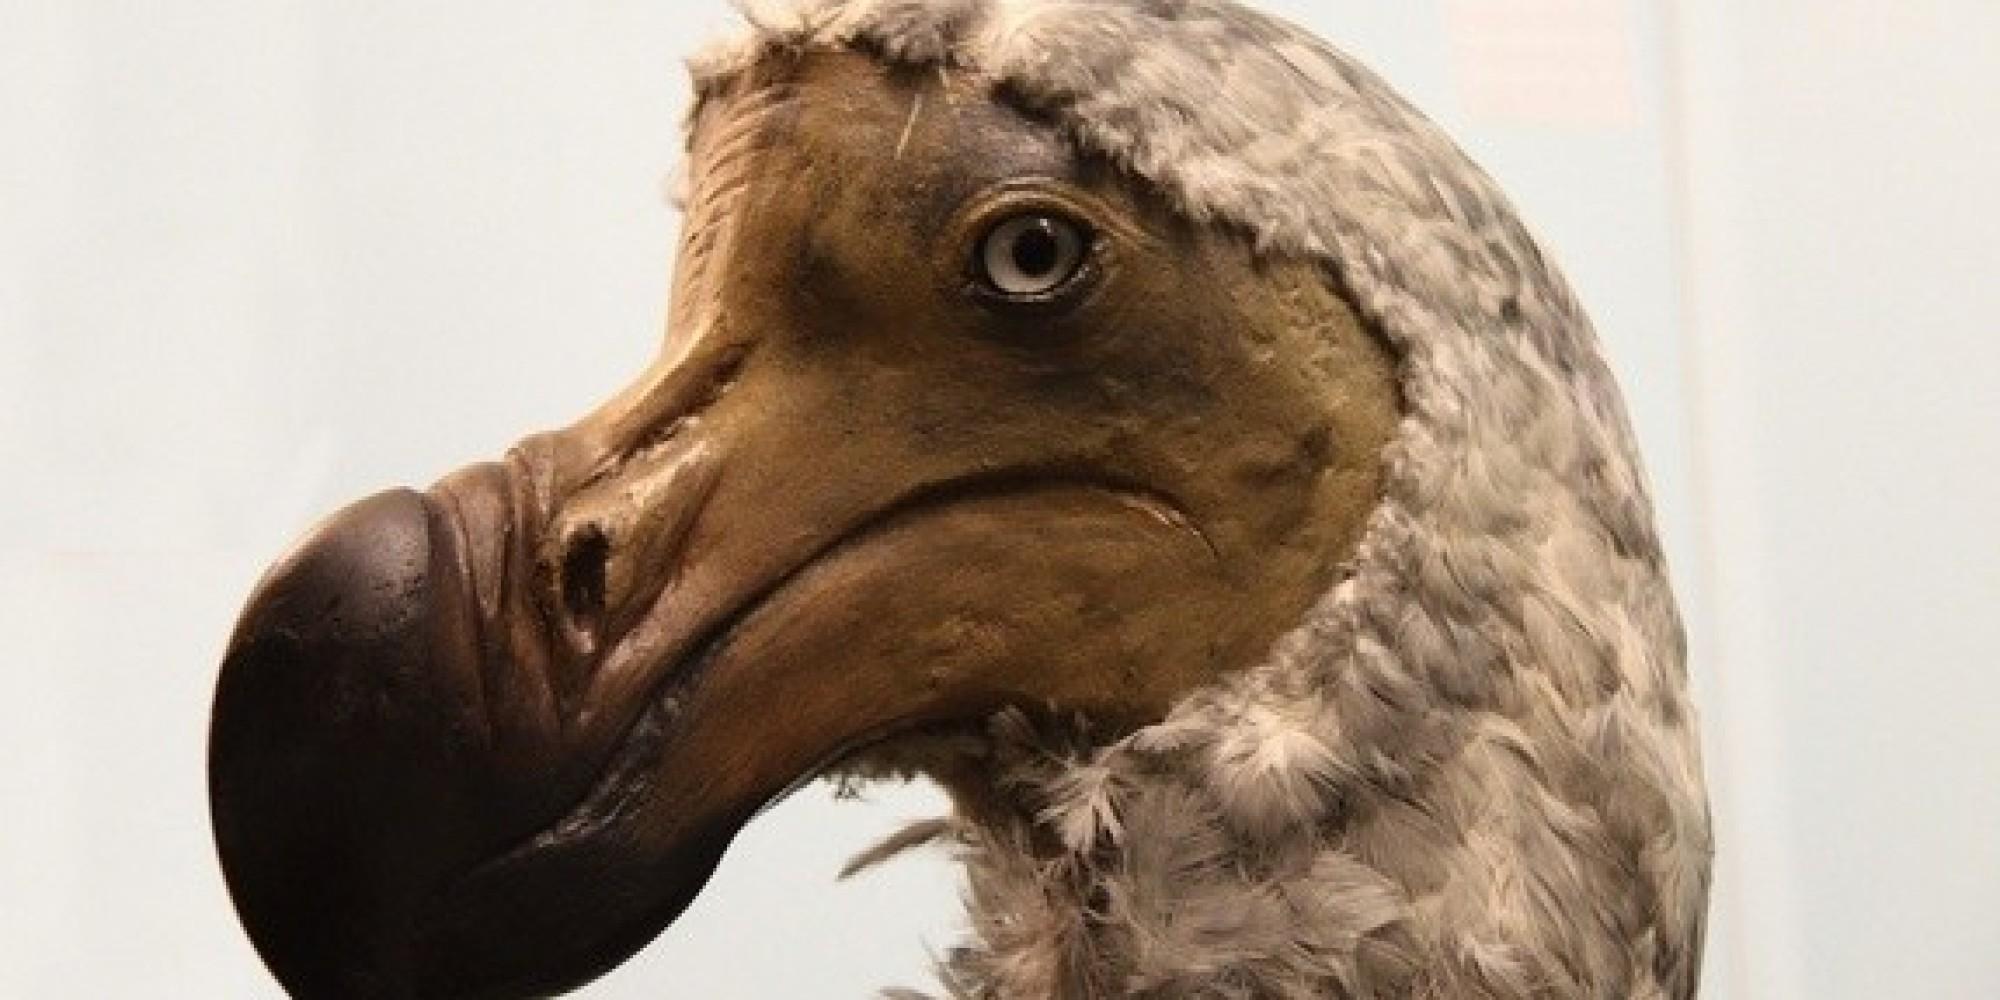 DODO-EXTINCTION-LATER-facebook jpgDodo Bird Sightings